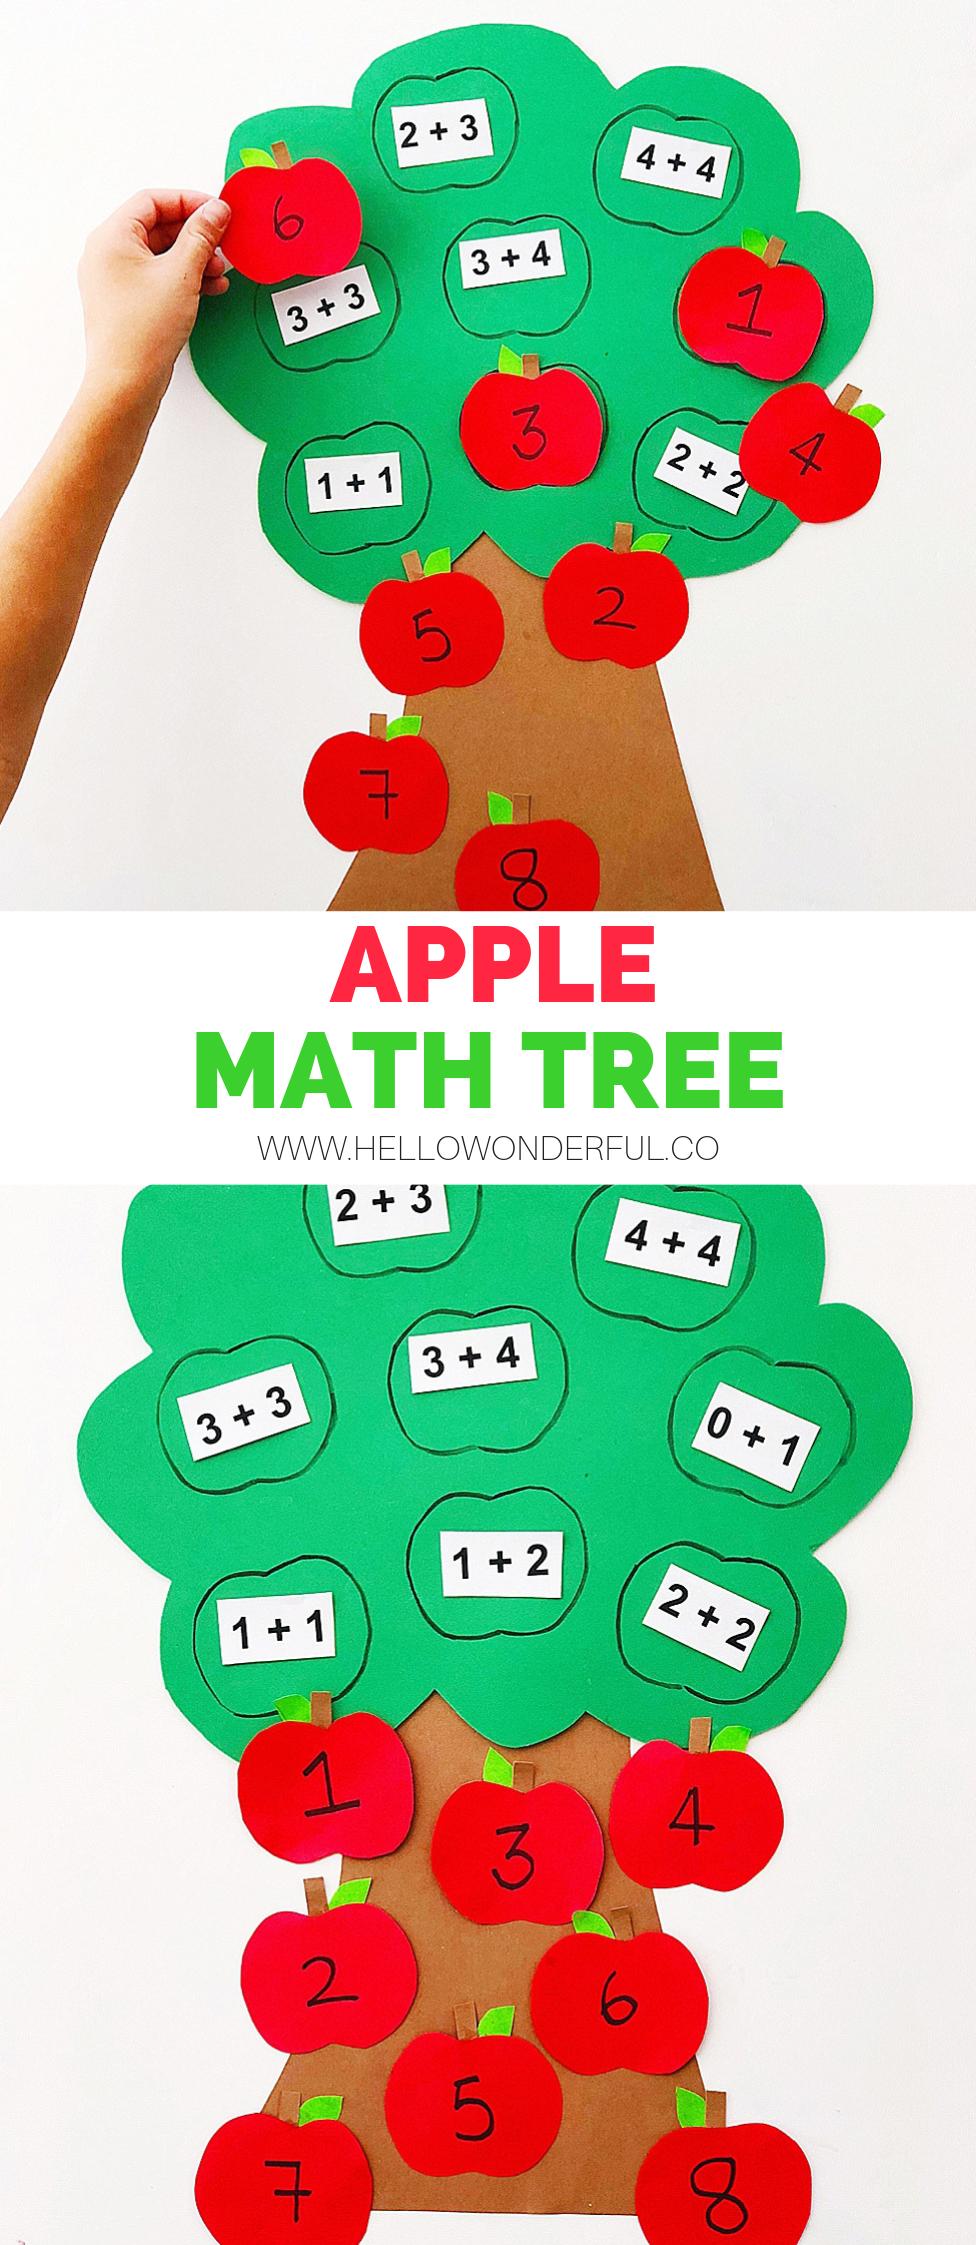 APPLE MATH TREE LEARNING ACTIVITY   занятия   Pinterest